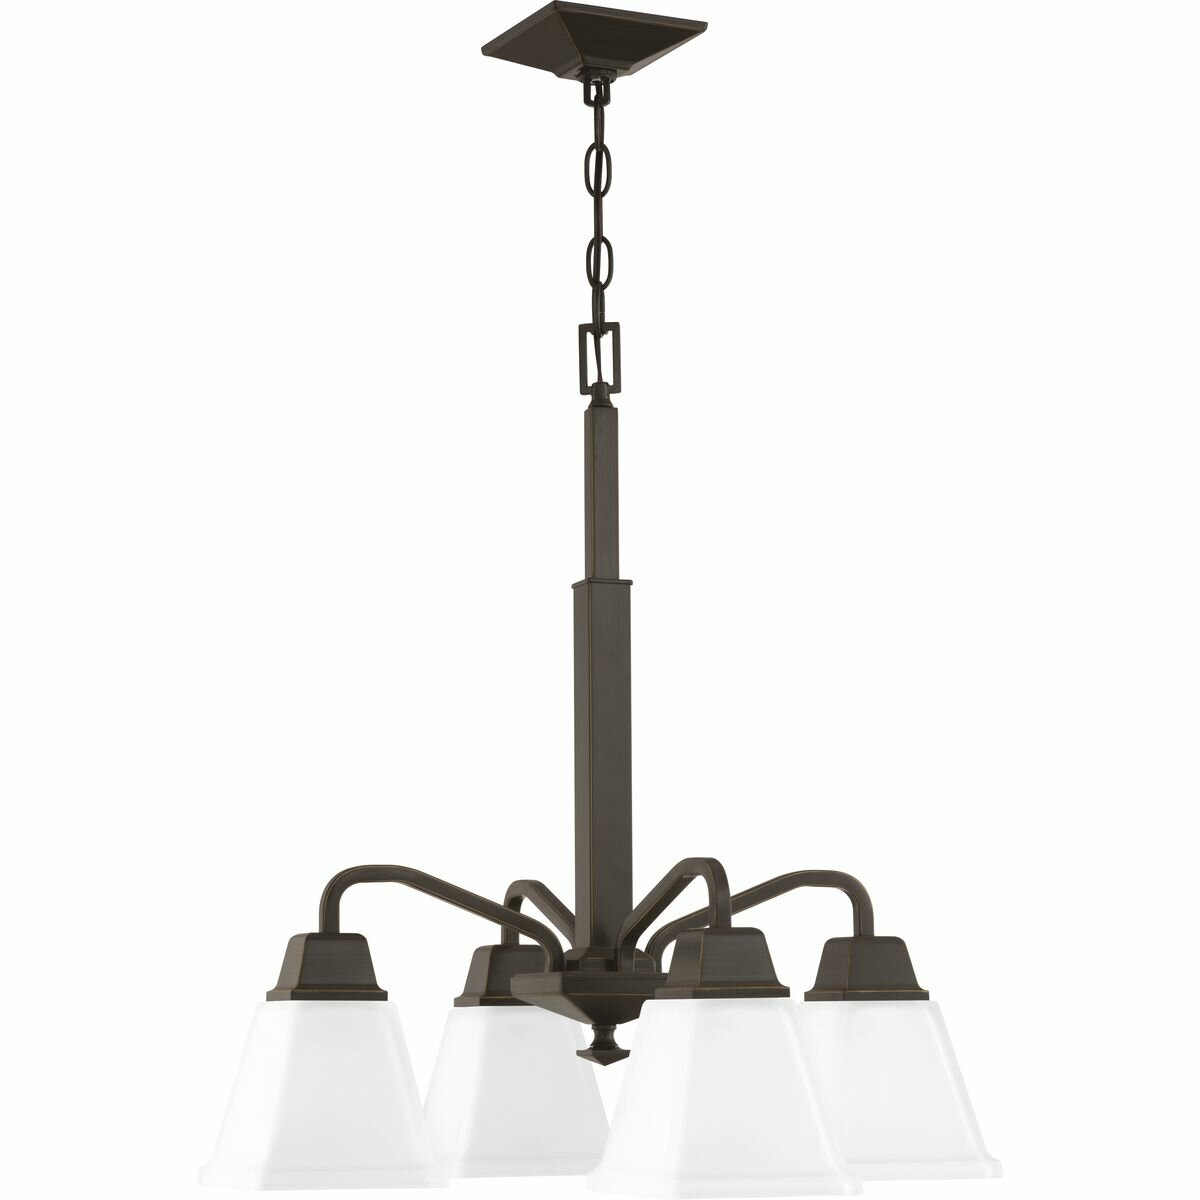 Ebern Designs Jadyn 4 Light Shaded Classic Traditional Chandelier Wayfair